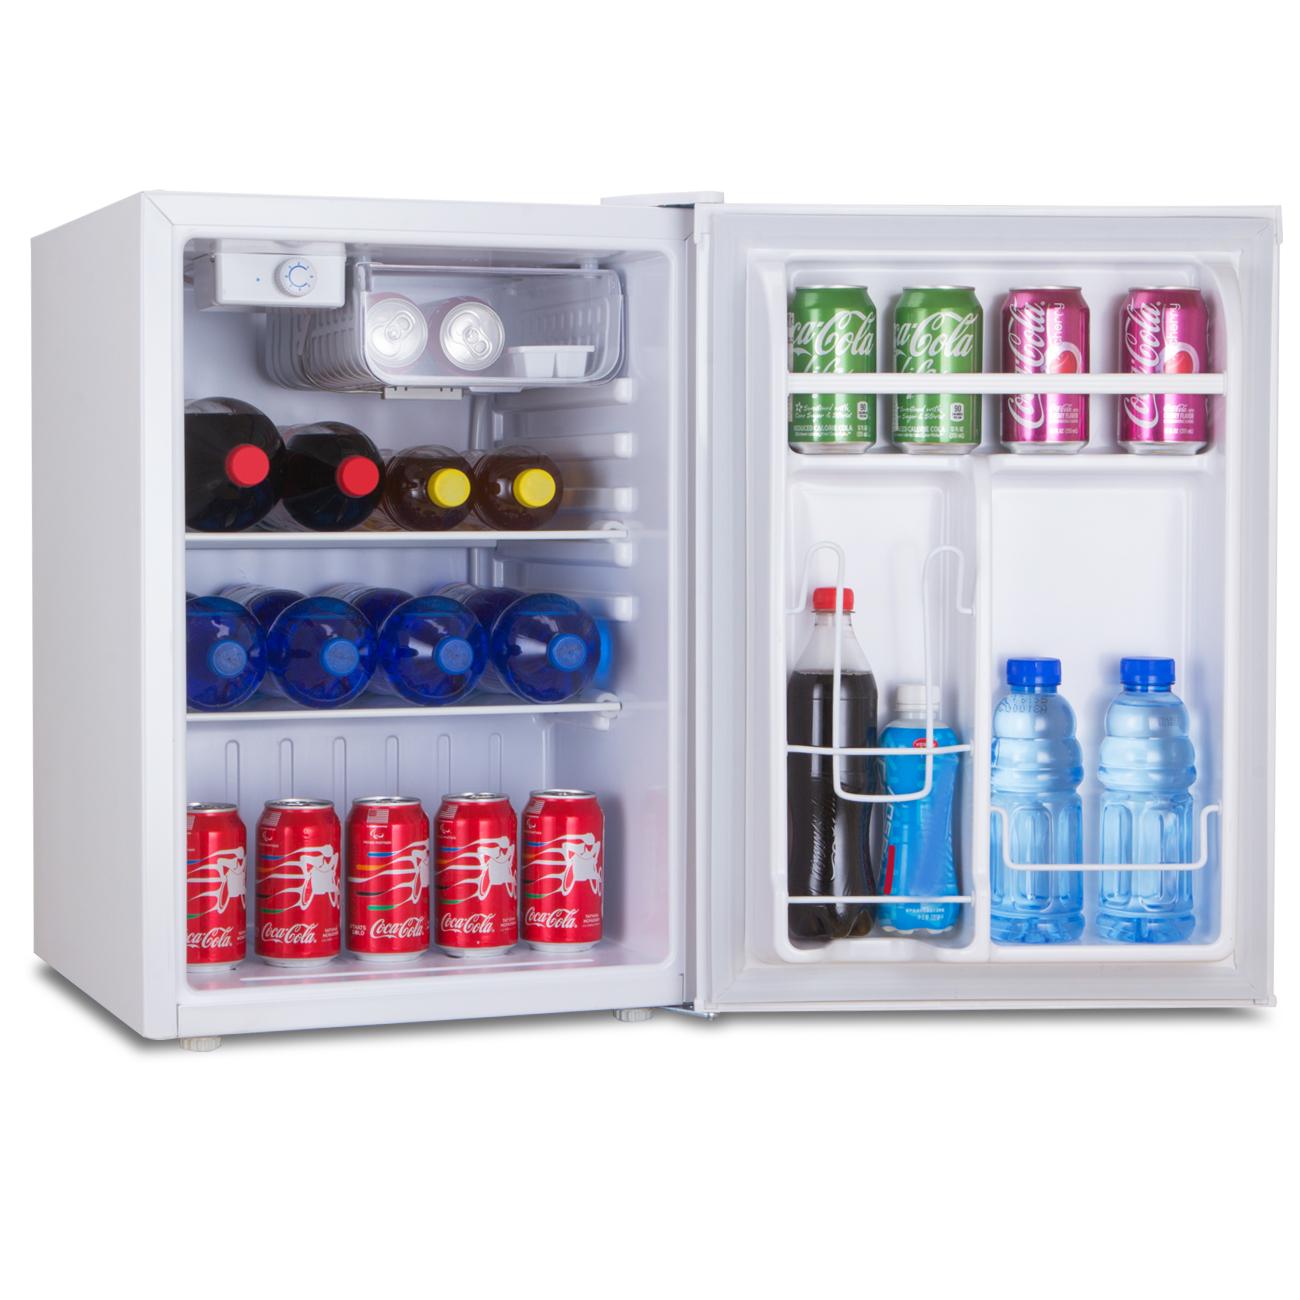 white 2 6 cu ft compact refrigerator mini freezer. Black Bedroom Furniture Sets. Home Design Ideas